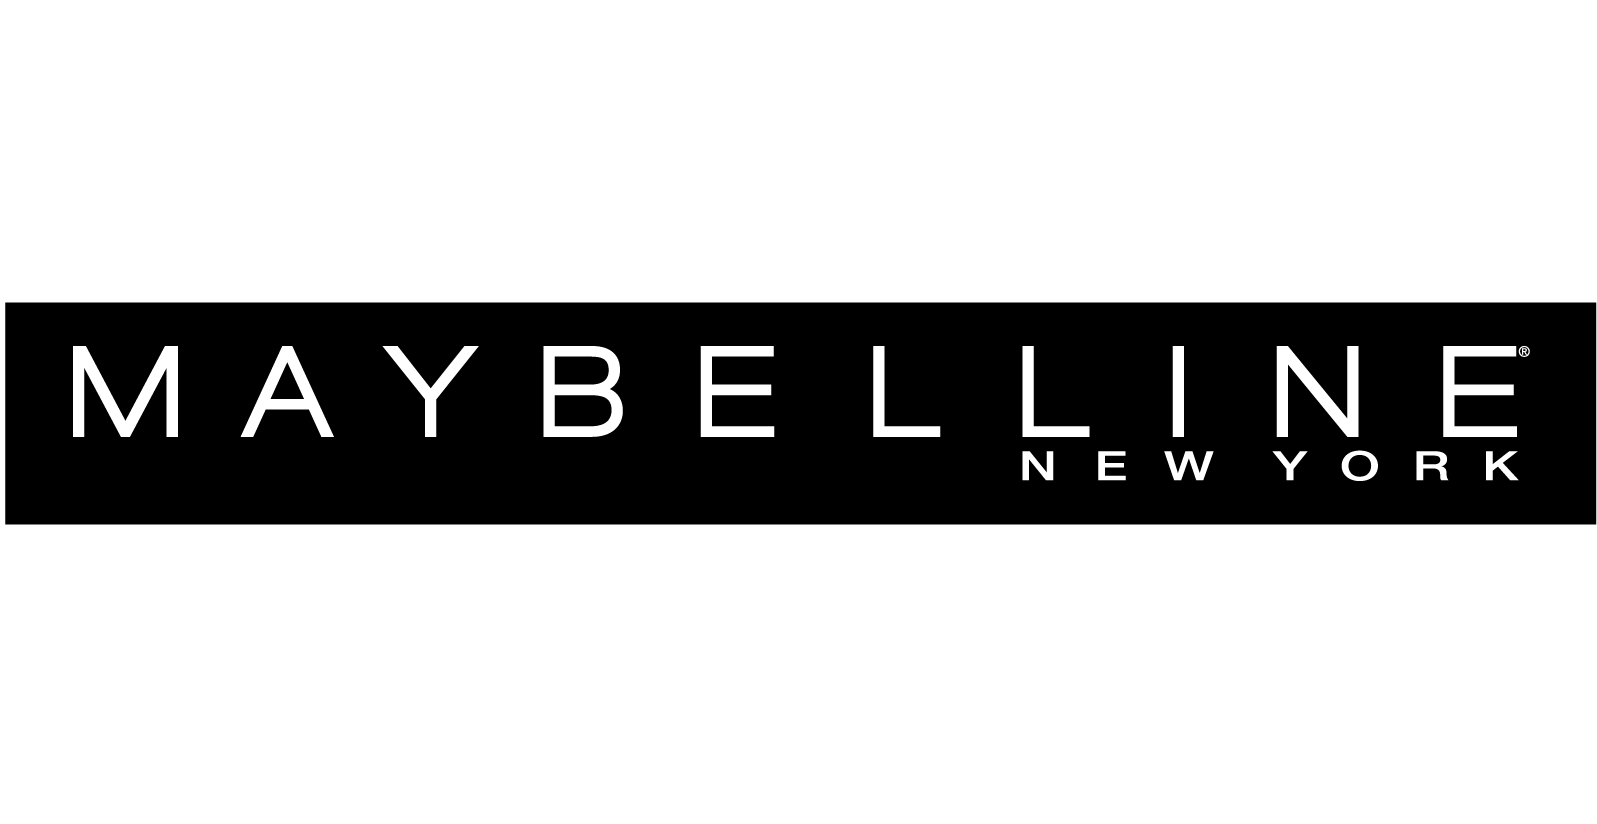 maybelline logo .png